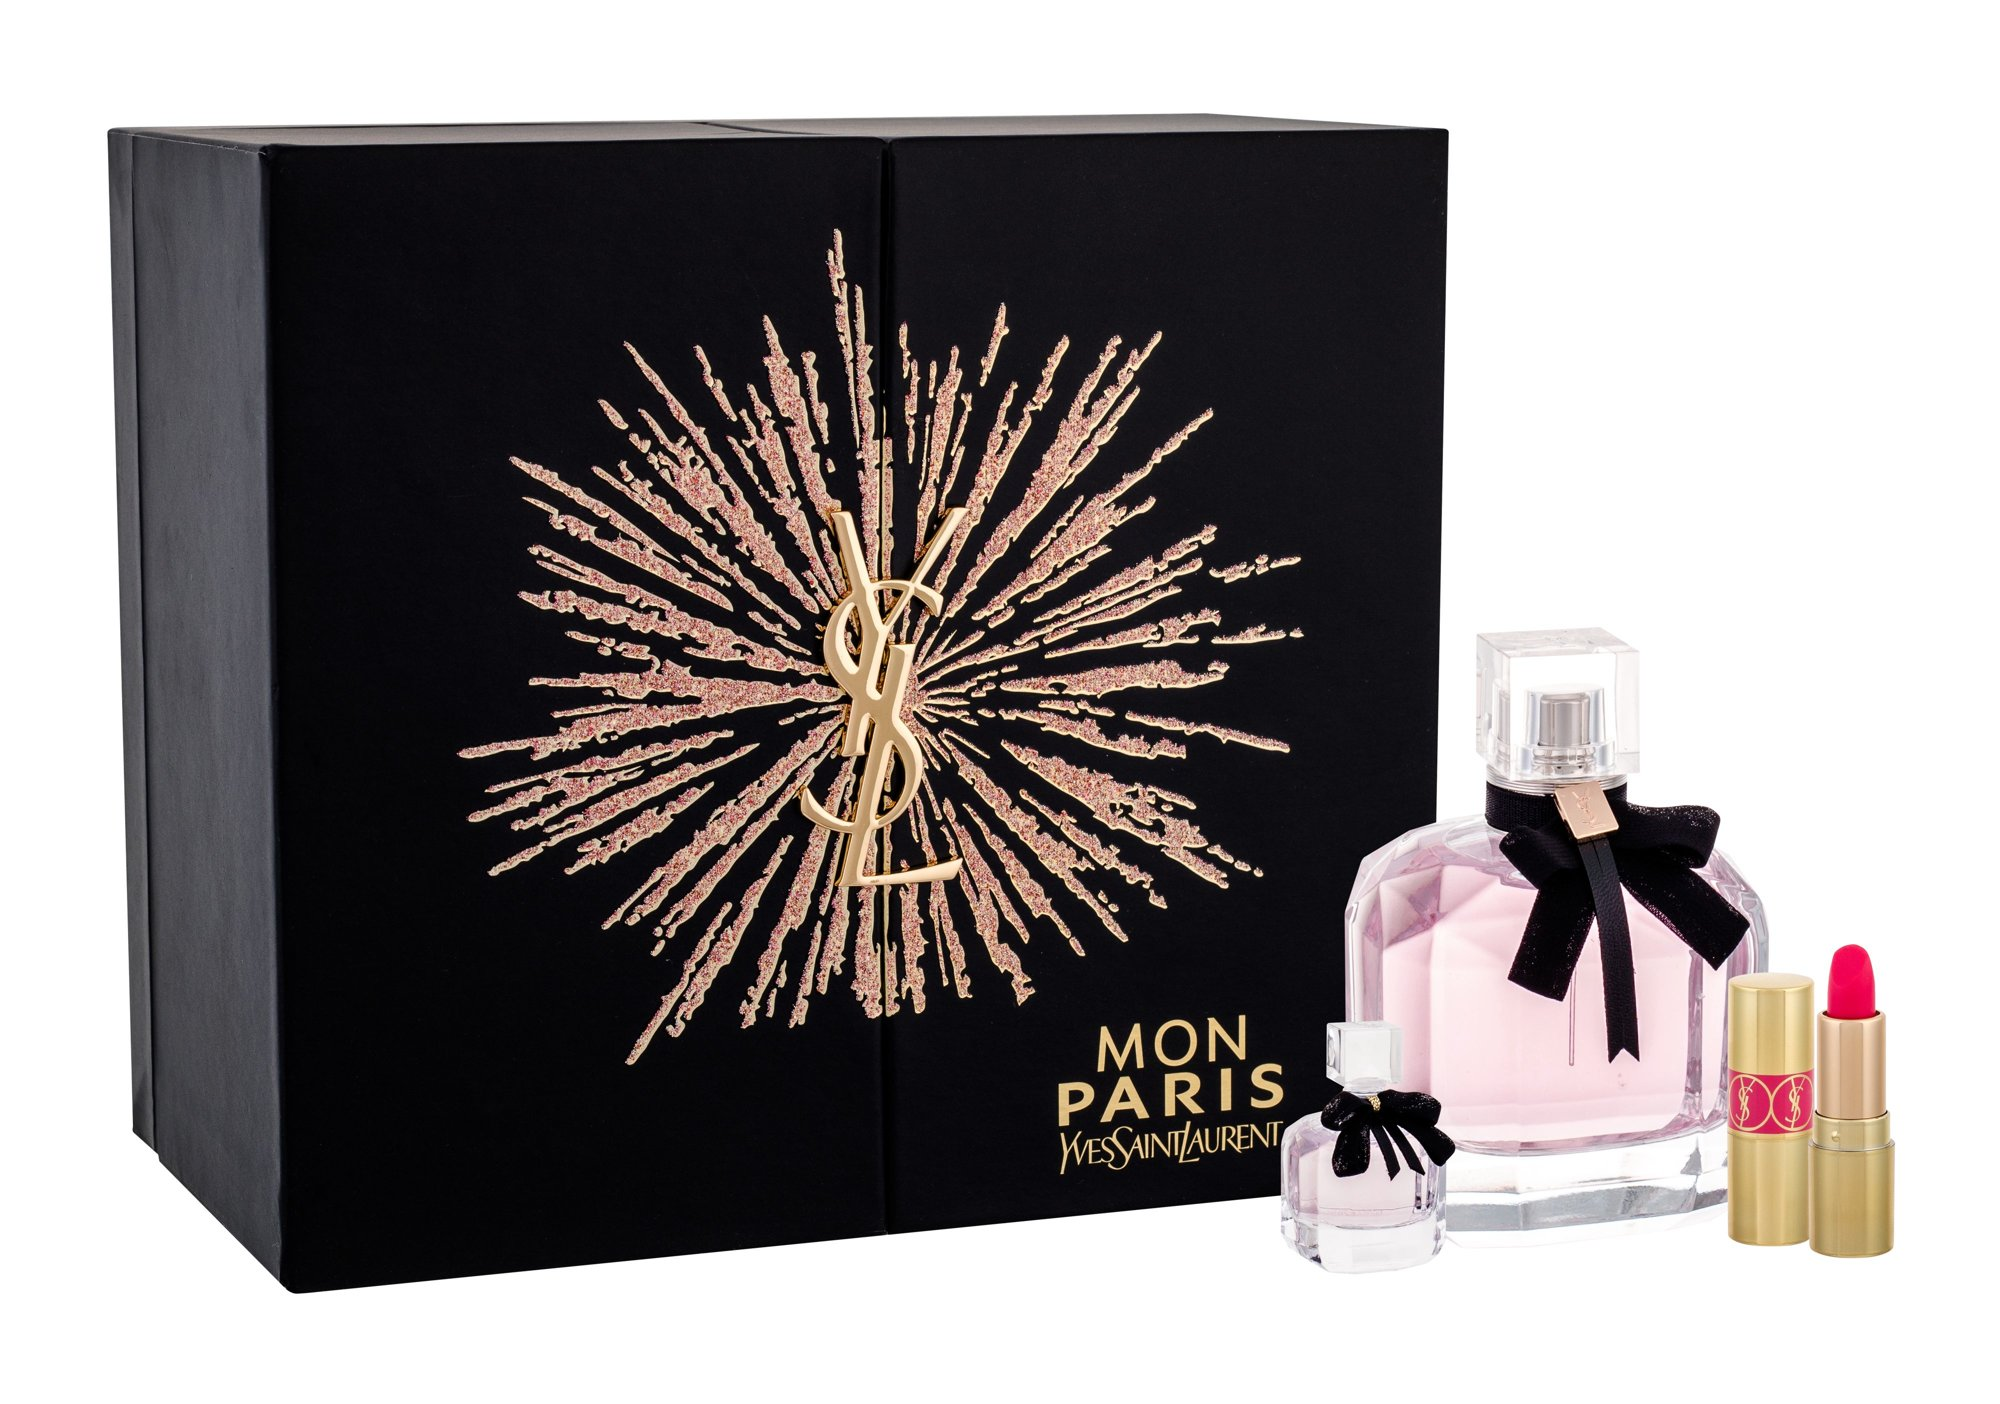 Yves Saint Laurent Mon Paris, parfumovaná voda 90 ml + parfumovaná voda 7,5 ml + rúž Rouge Volupte Shine N. 49